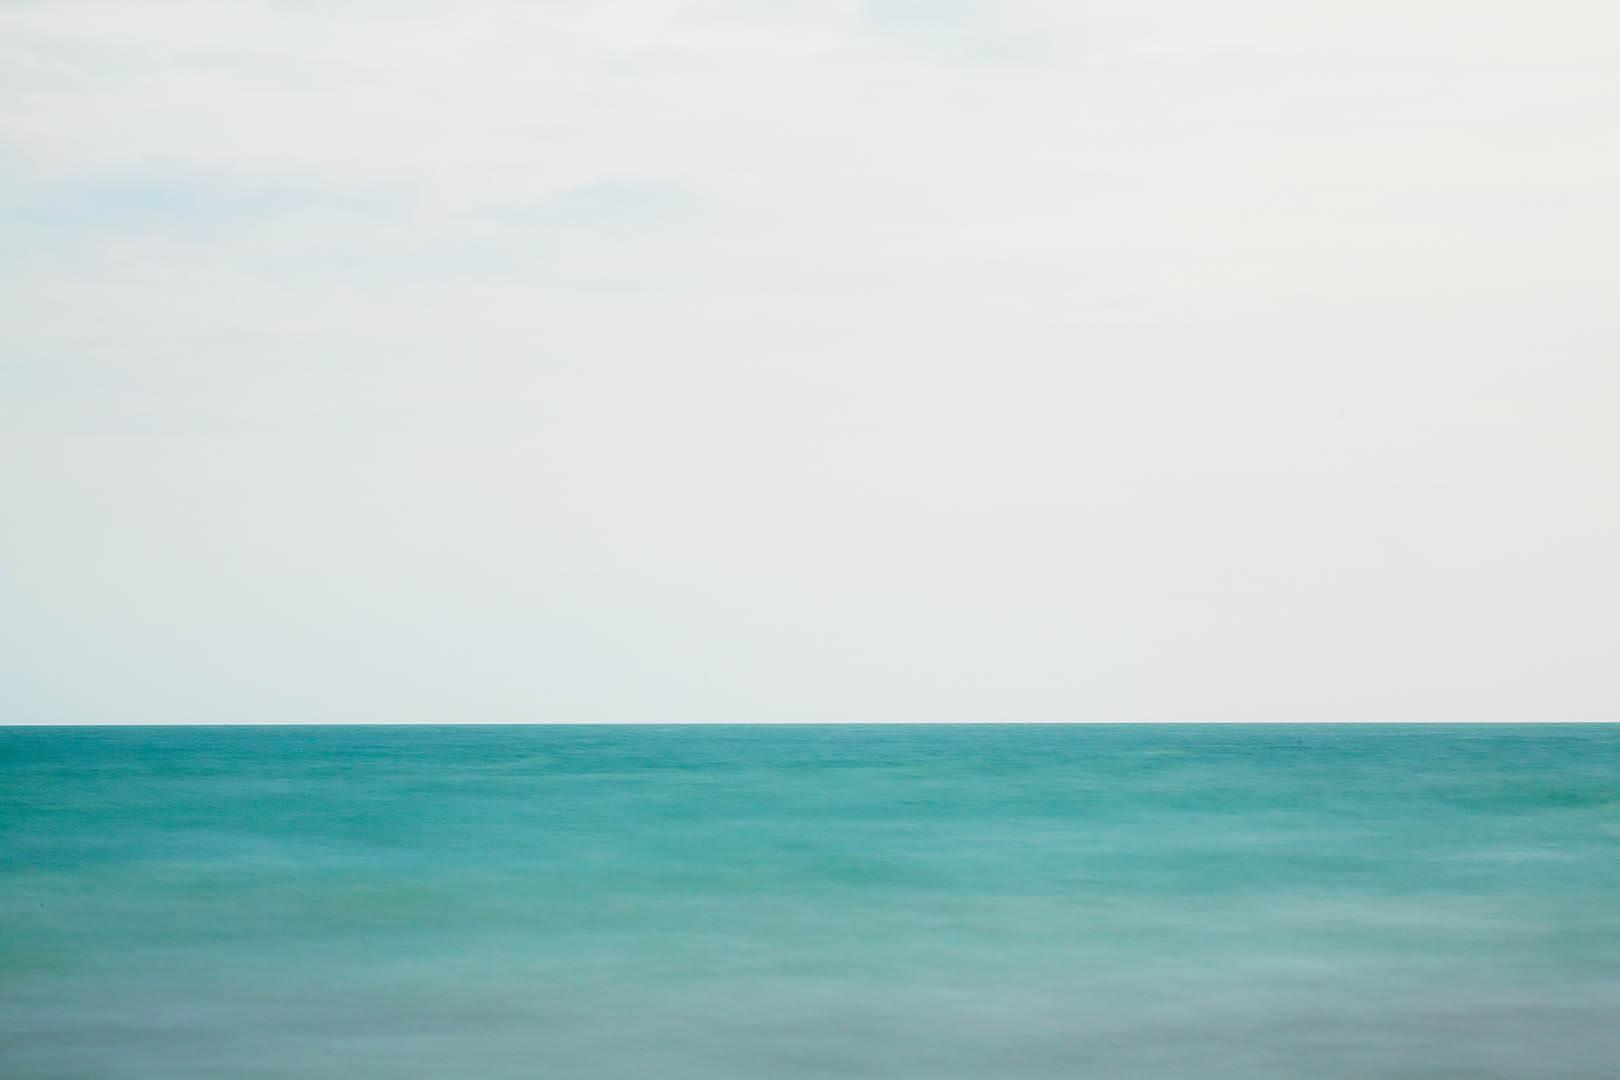 Keyhaven Horizon #4